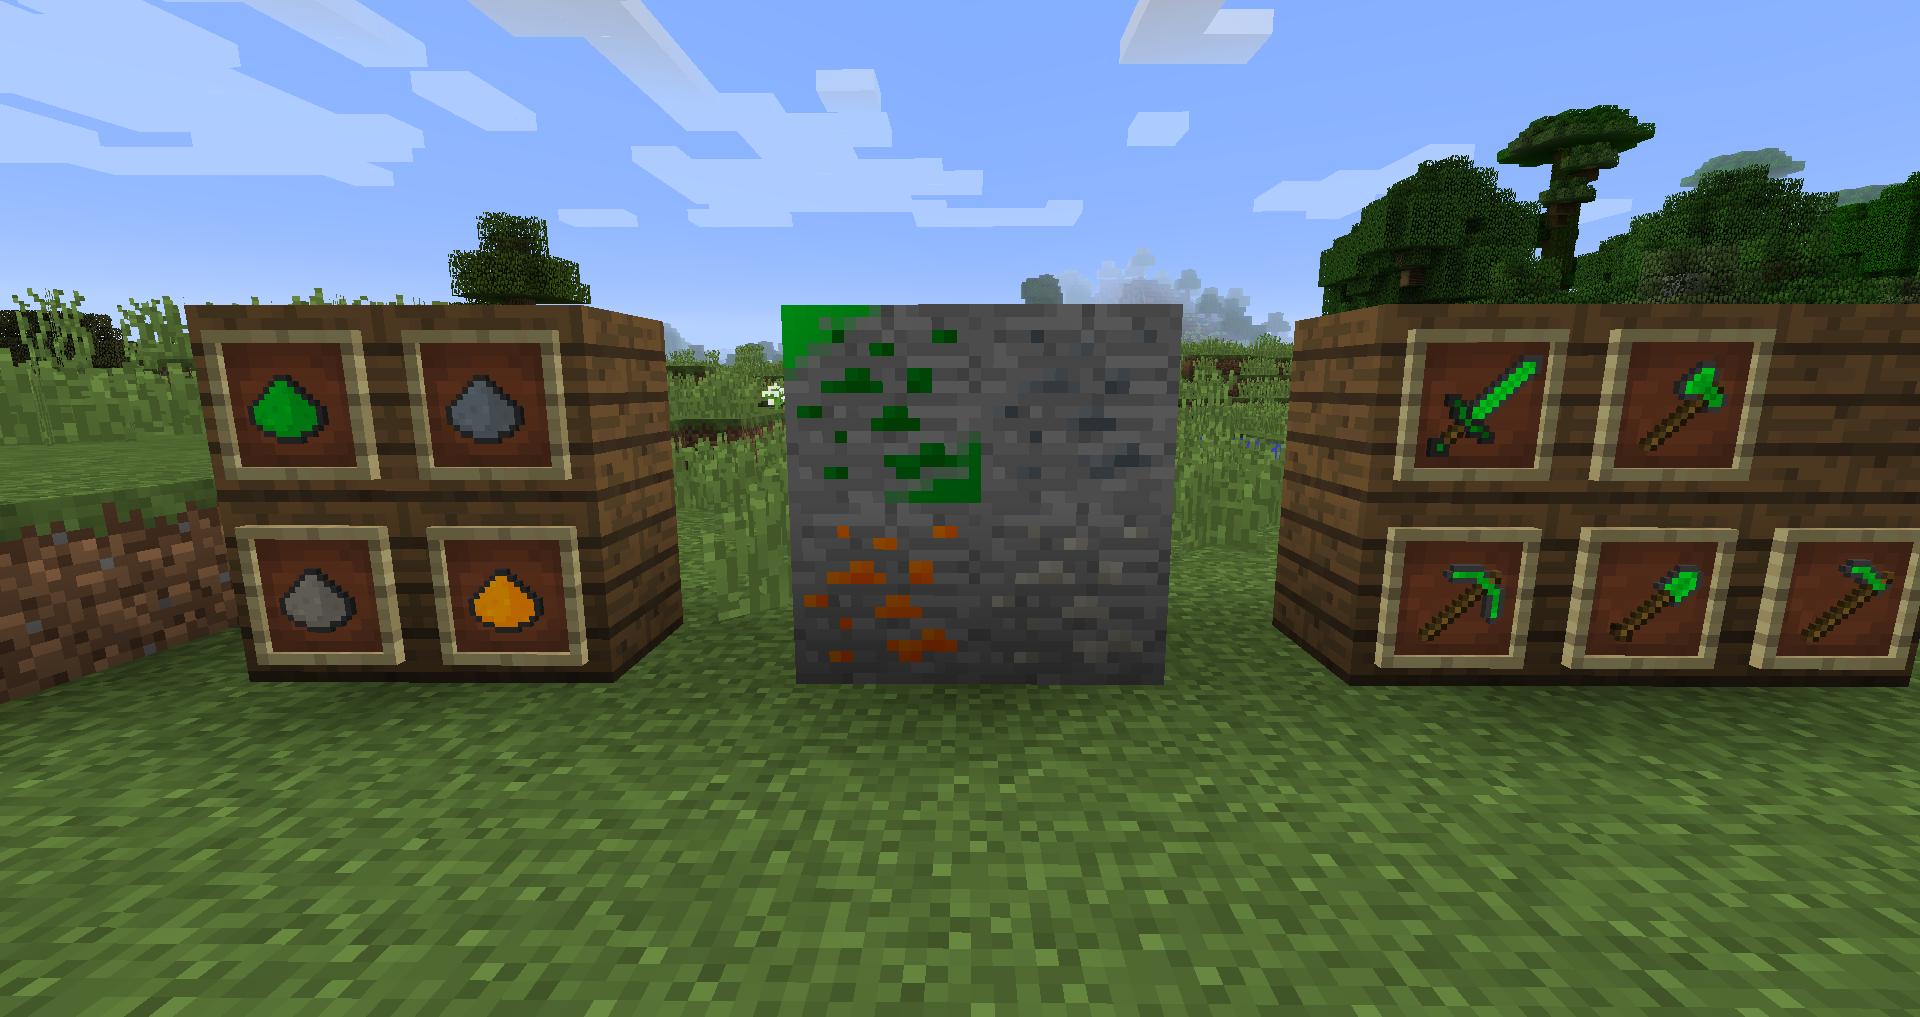 Mod blocks and items